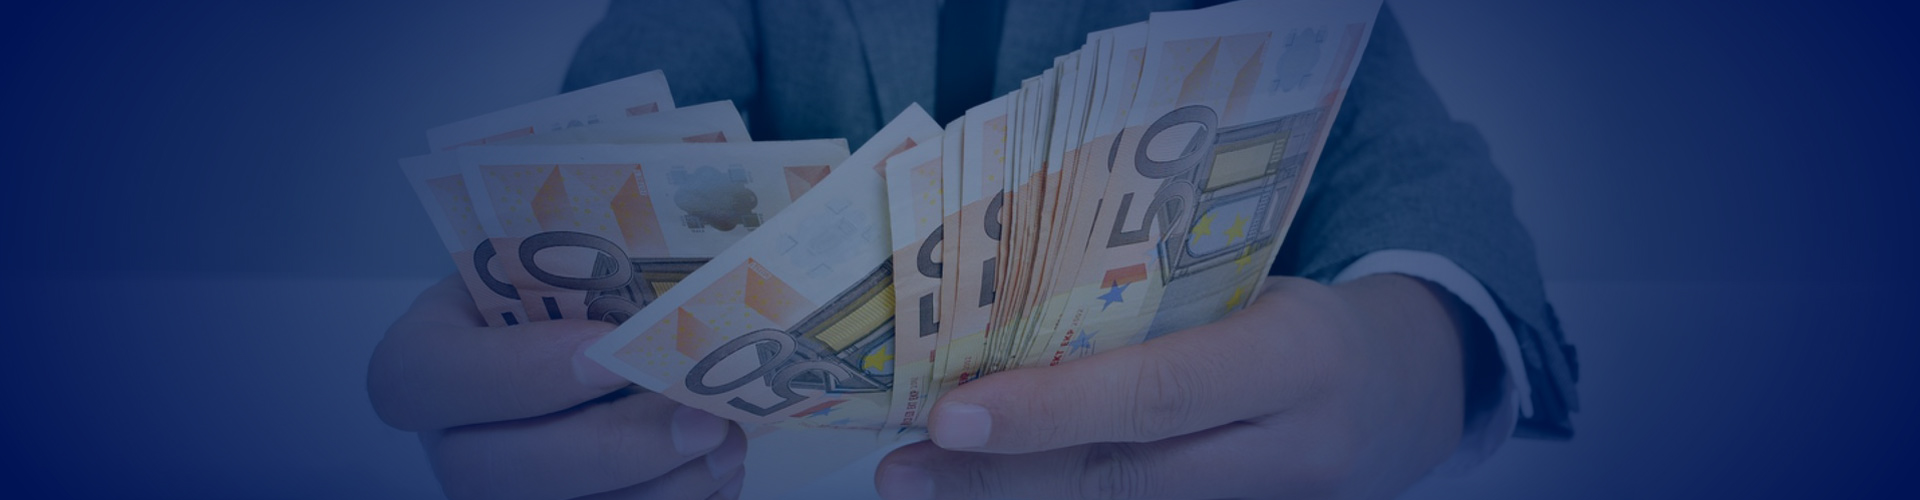 Umsatzsteuererstattung | Tecnocompany